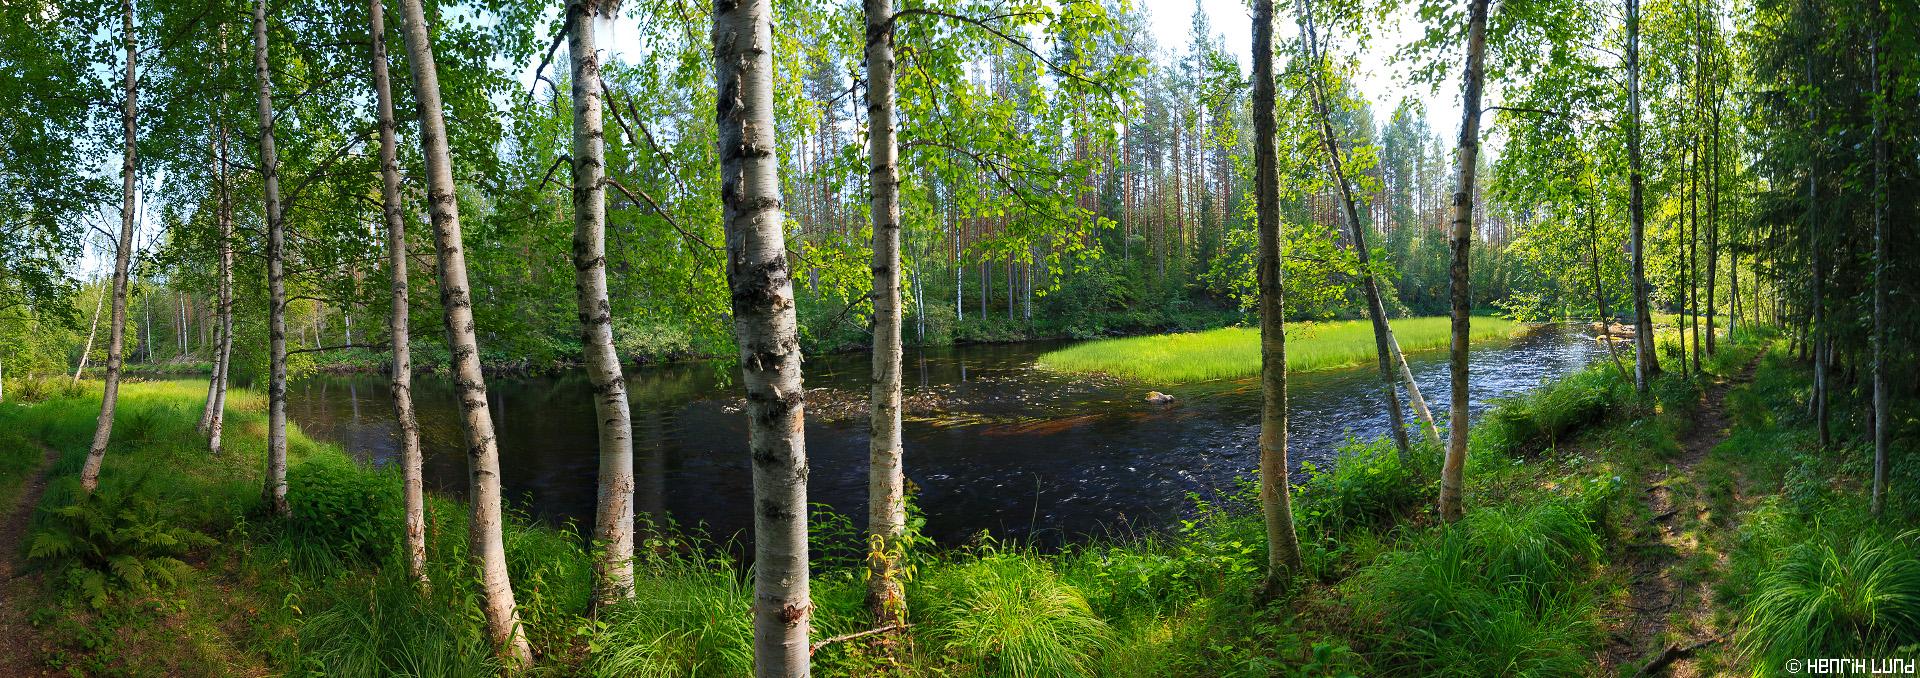 Panorama view over Vekarus river in Northern Carelia, Joensuu, Finland. August 2014.